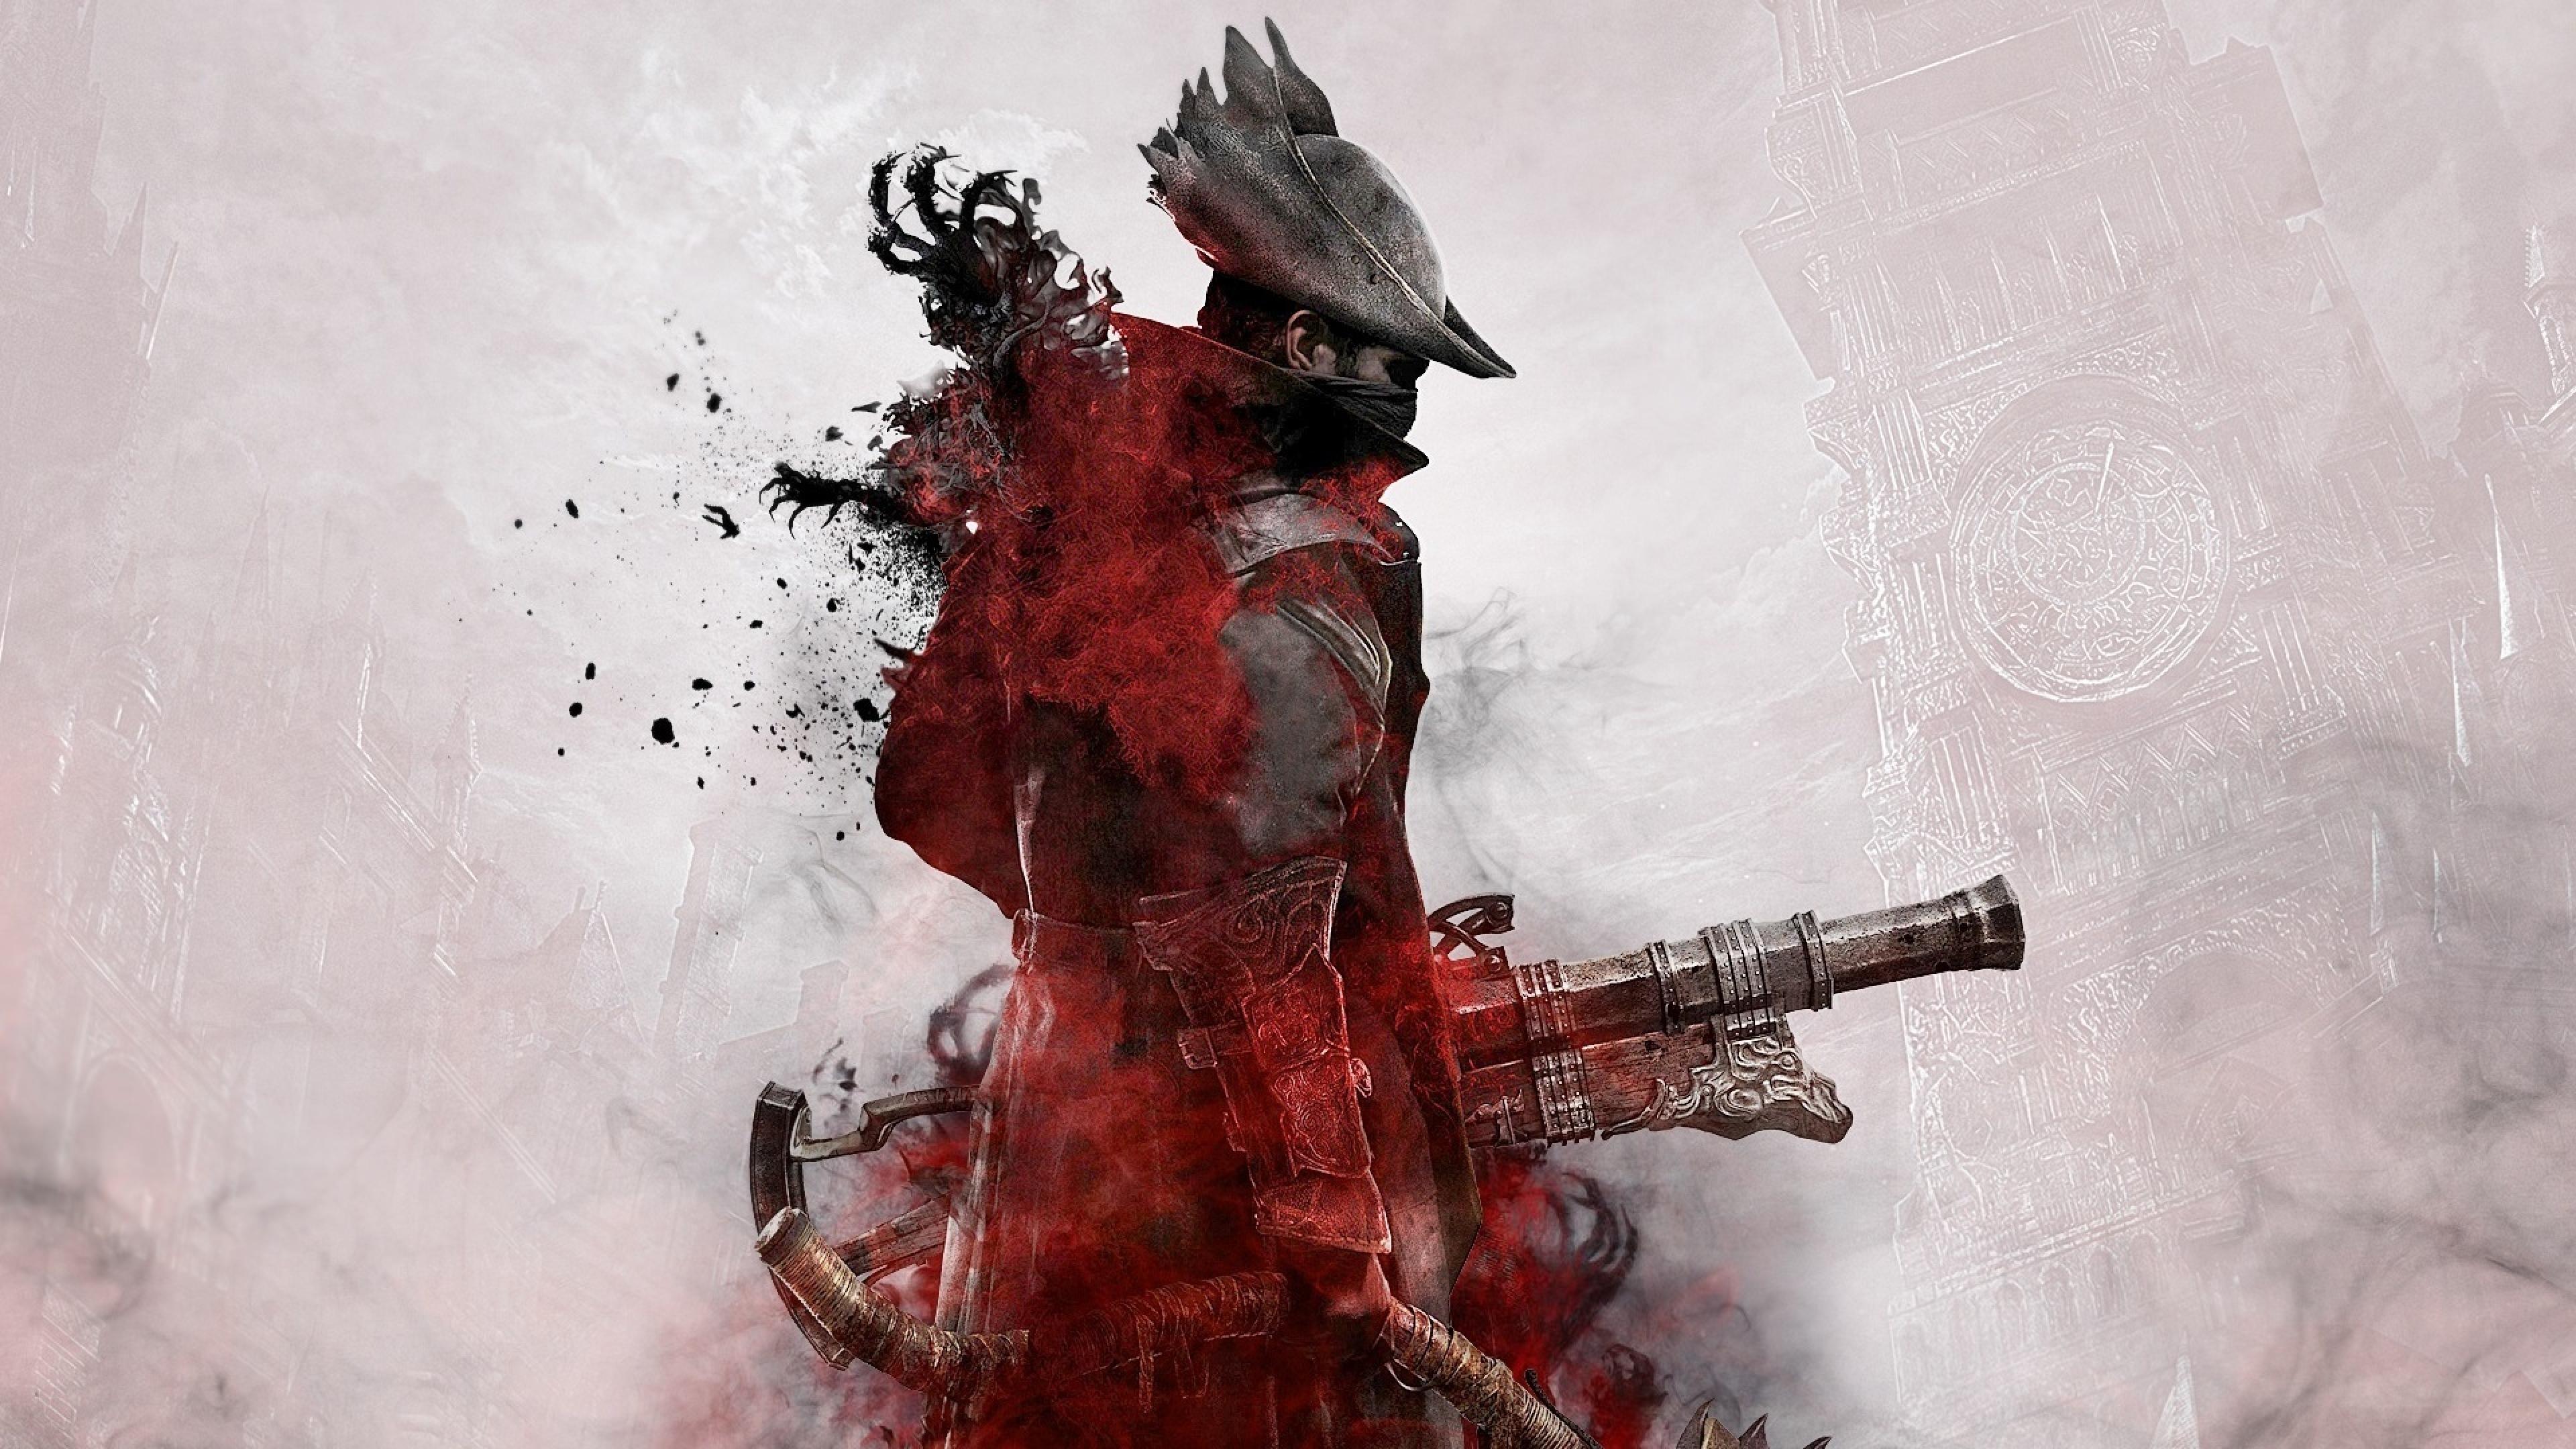 Bloodborne #2 ( 4K ) - PS4Wallpapers.com